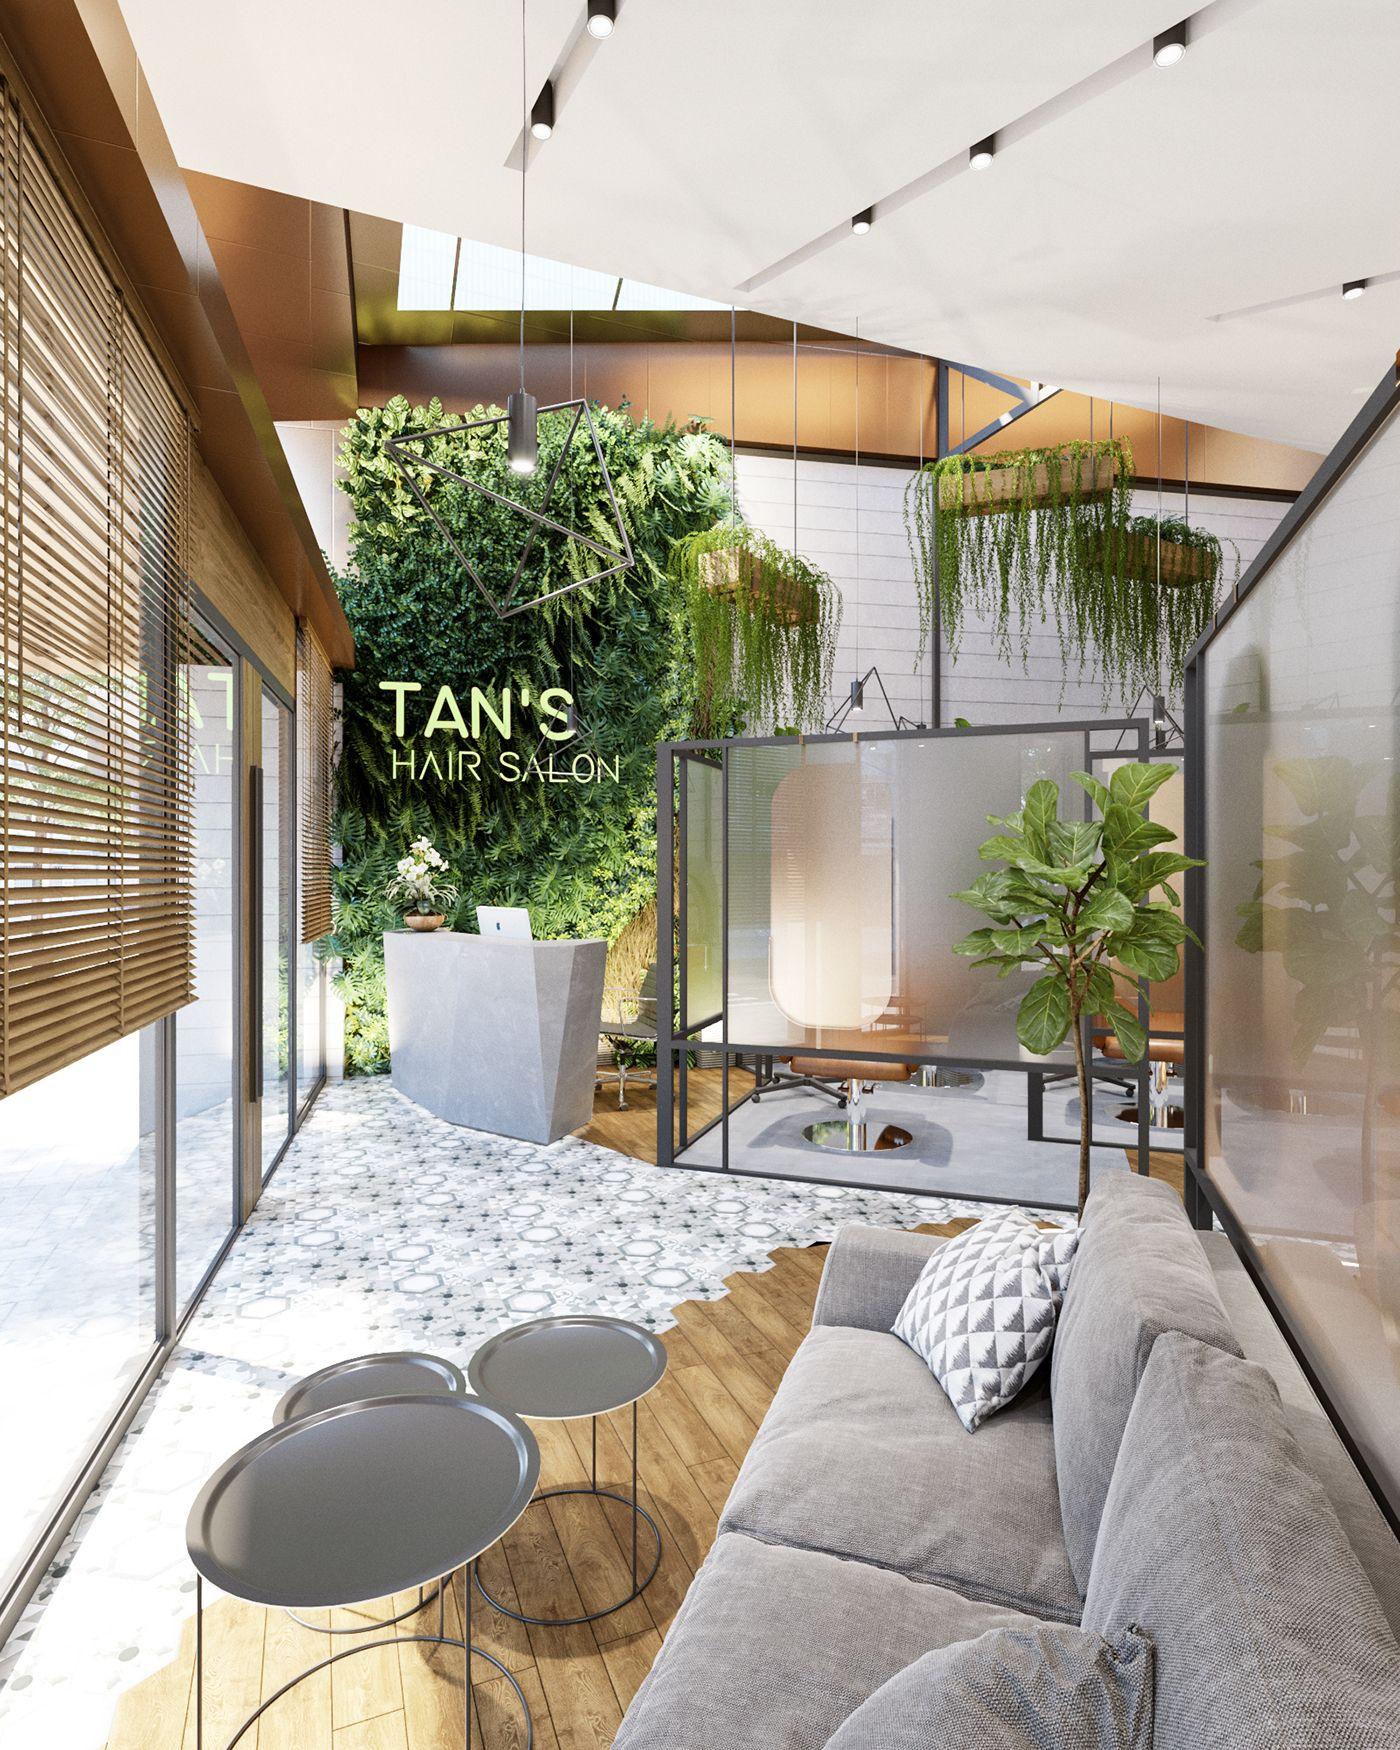 3d Room Interior Design: 3D Interior Scenes File 3dsmax Model Tan's Hair Salon By